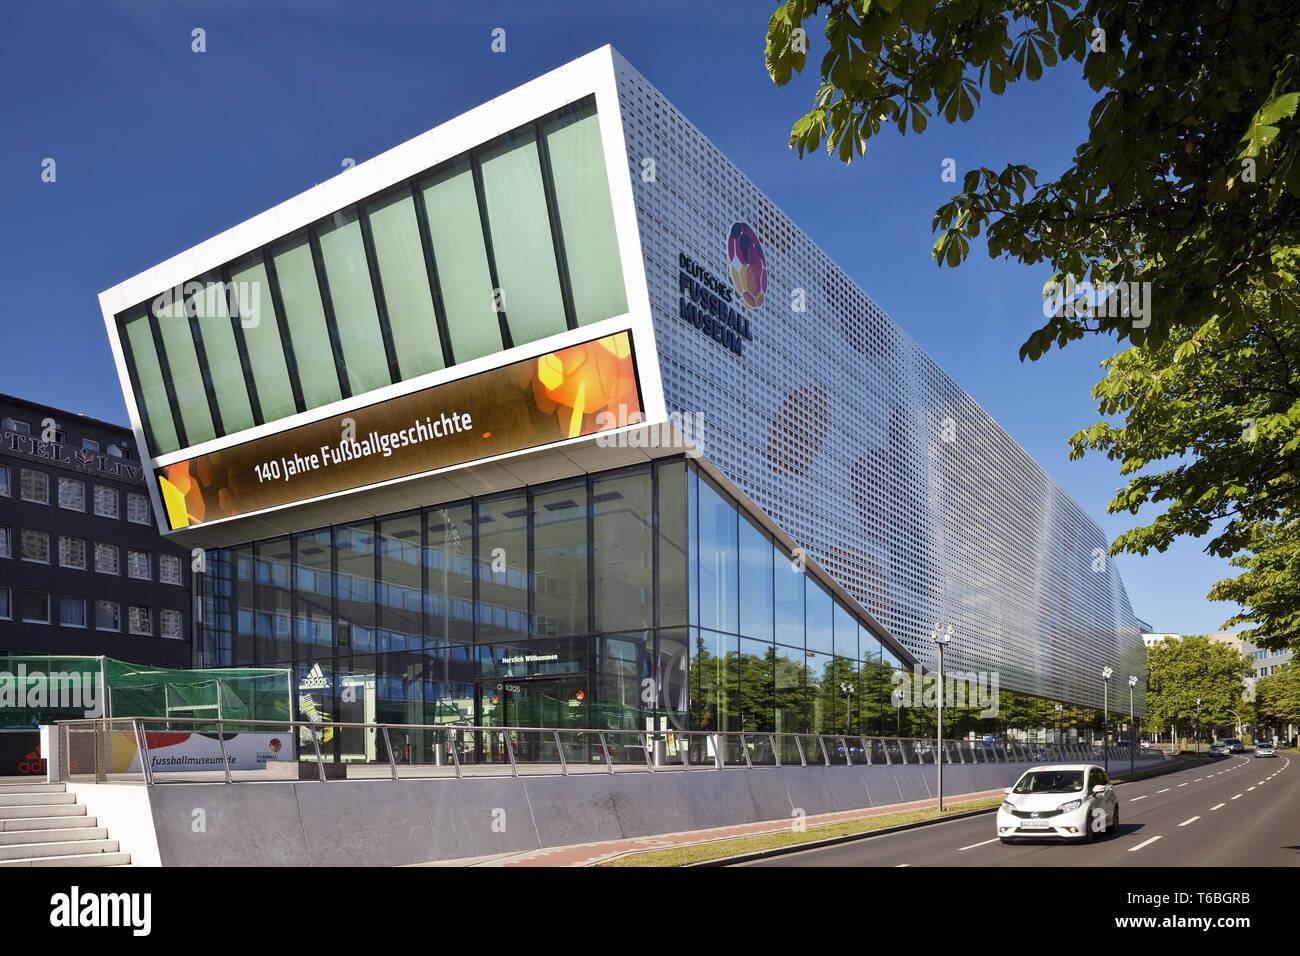 German Football Museum, Dortmund, Ruhr Area, Germany, Europe - Stock Image